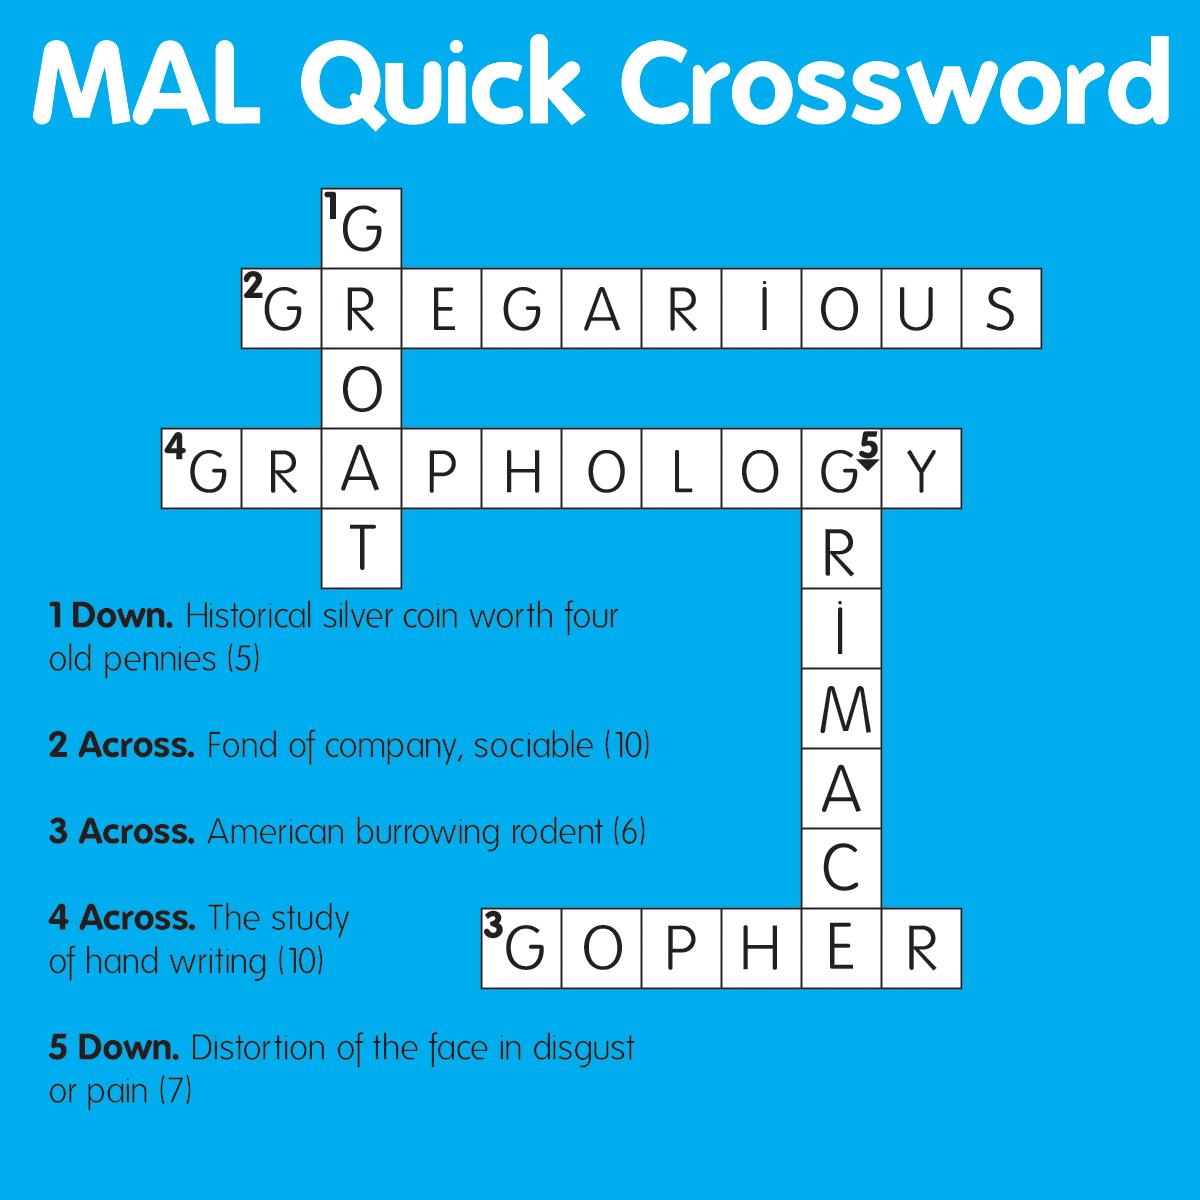 Market avenue social media management crossword puzzle answers market avenue social media management crossword puzzle answers here are the solutions fandeluxe Image collections